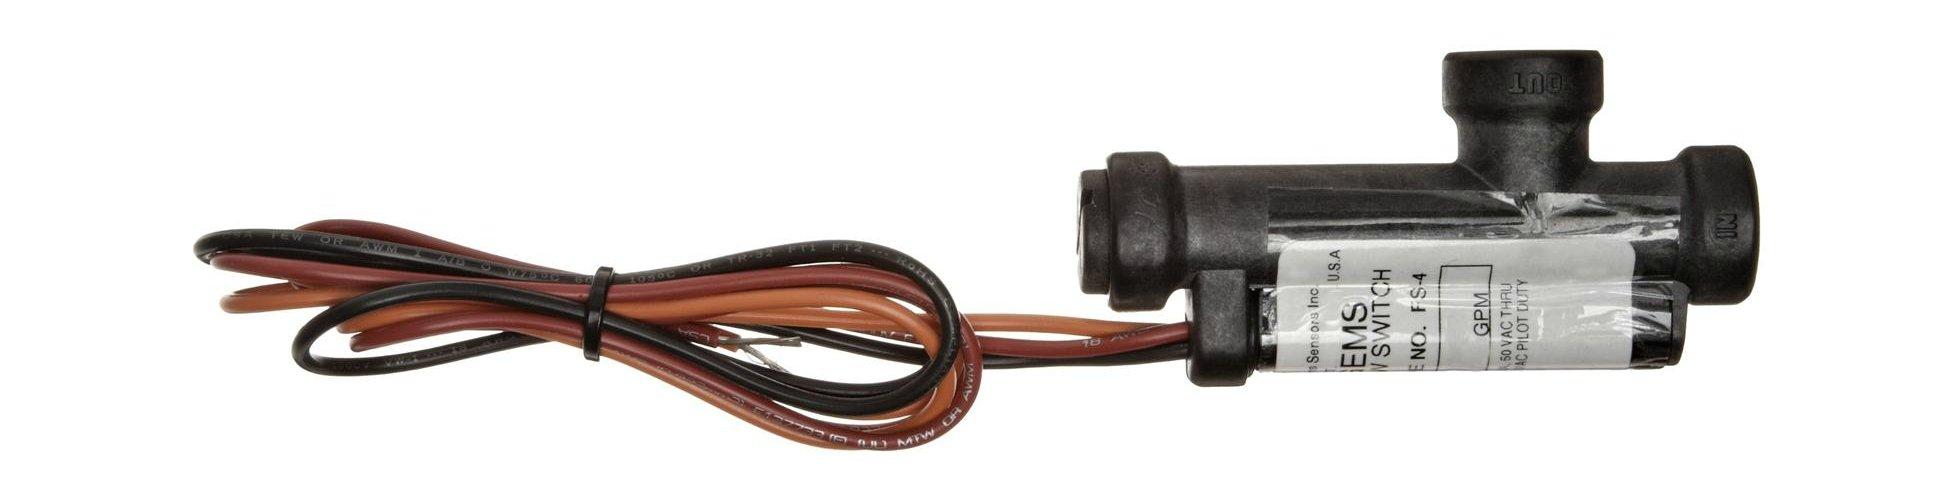 Gems Sensors FS-4 Series Ryton Flow Switch, Elbow, Piston Type, SPST Switch, Normally Open, 0.1 gpm Flow Setting, 9/16''-18 UNF-2B